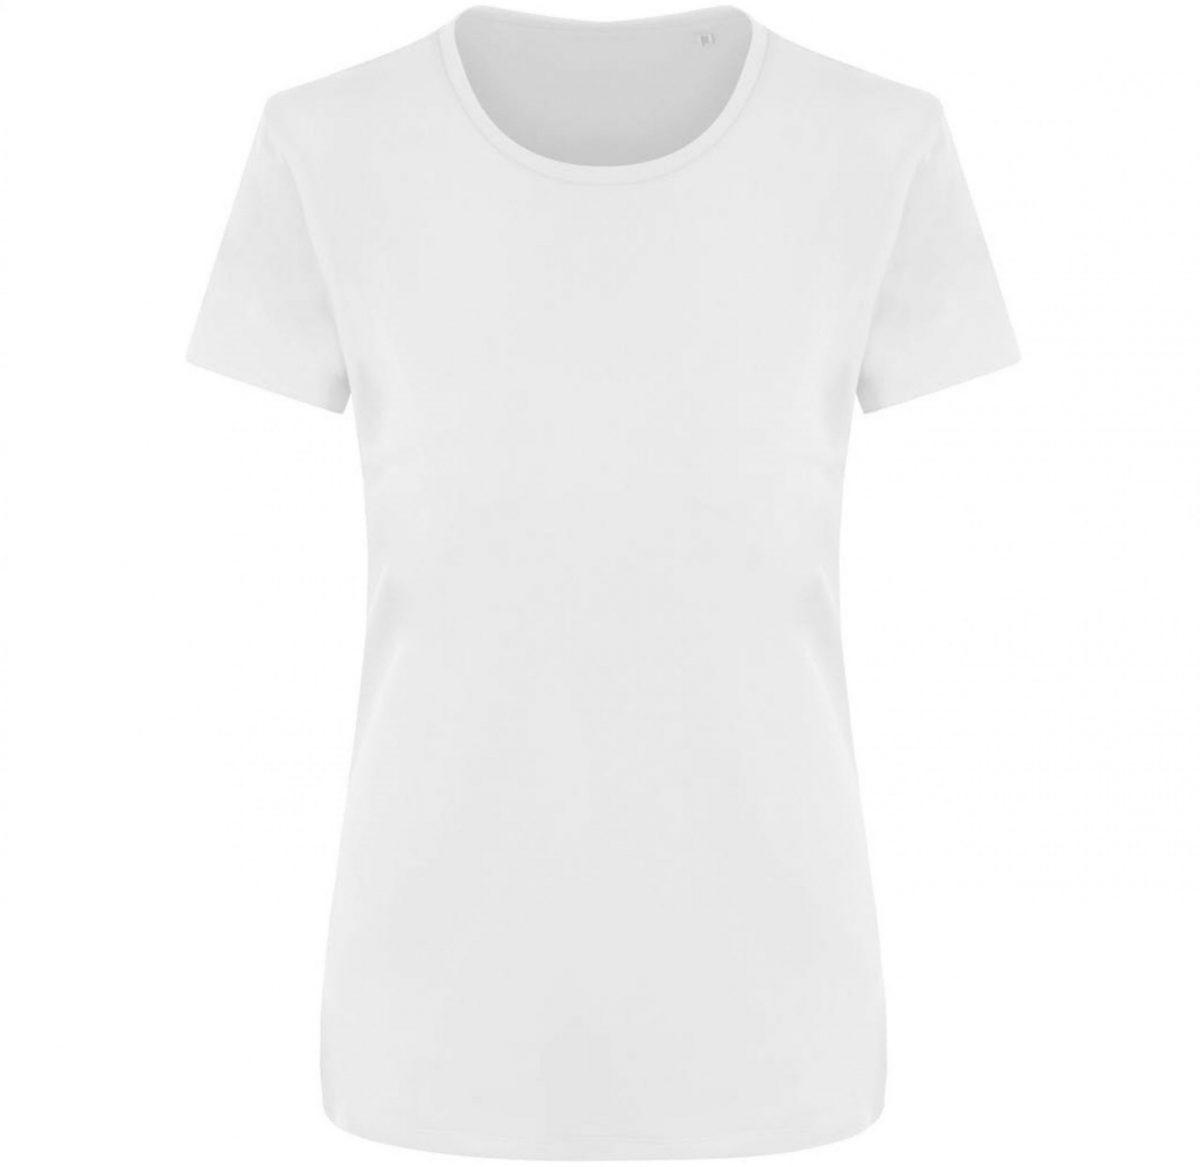 Tee-Shirt Femme Performance – Blanc